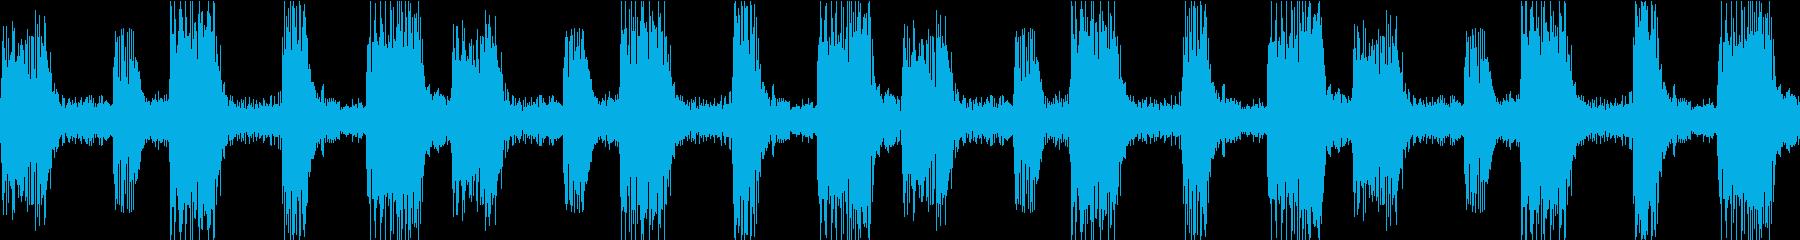 House コードシンセ 2 音楽制作用の再生済みの波形